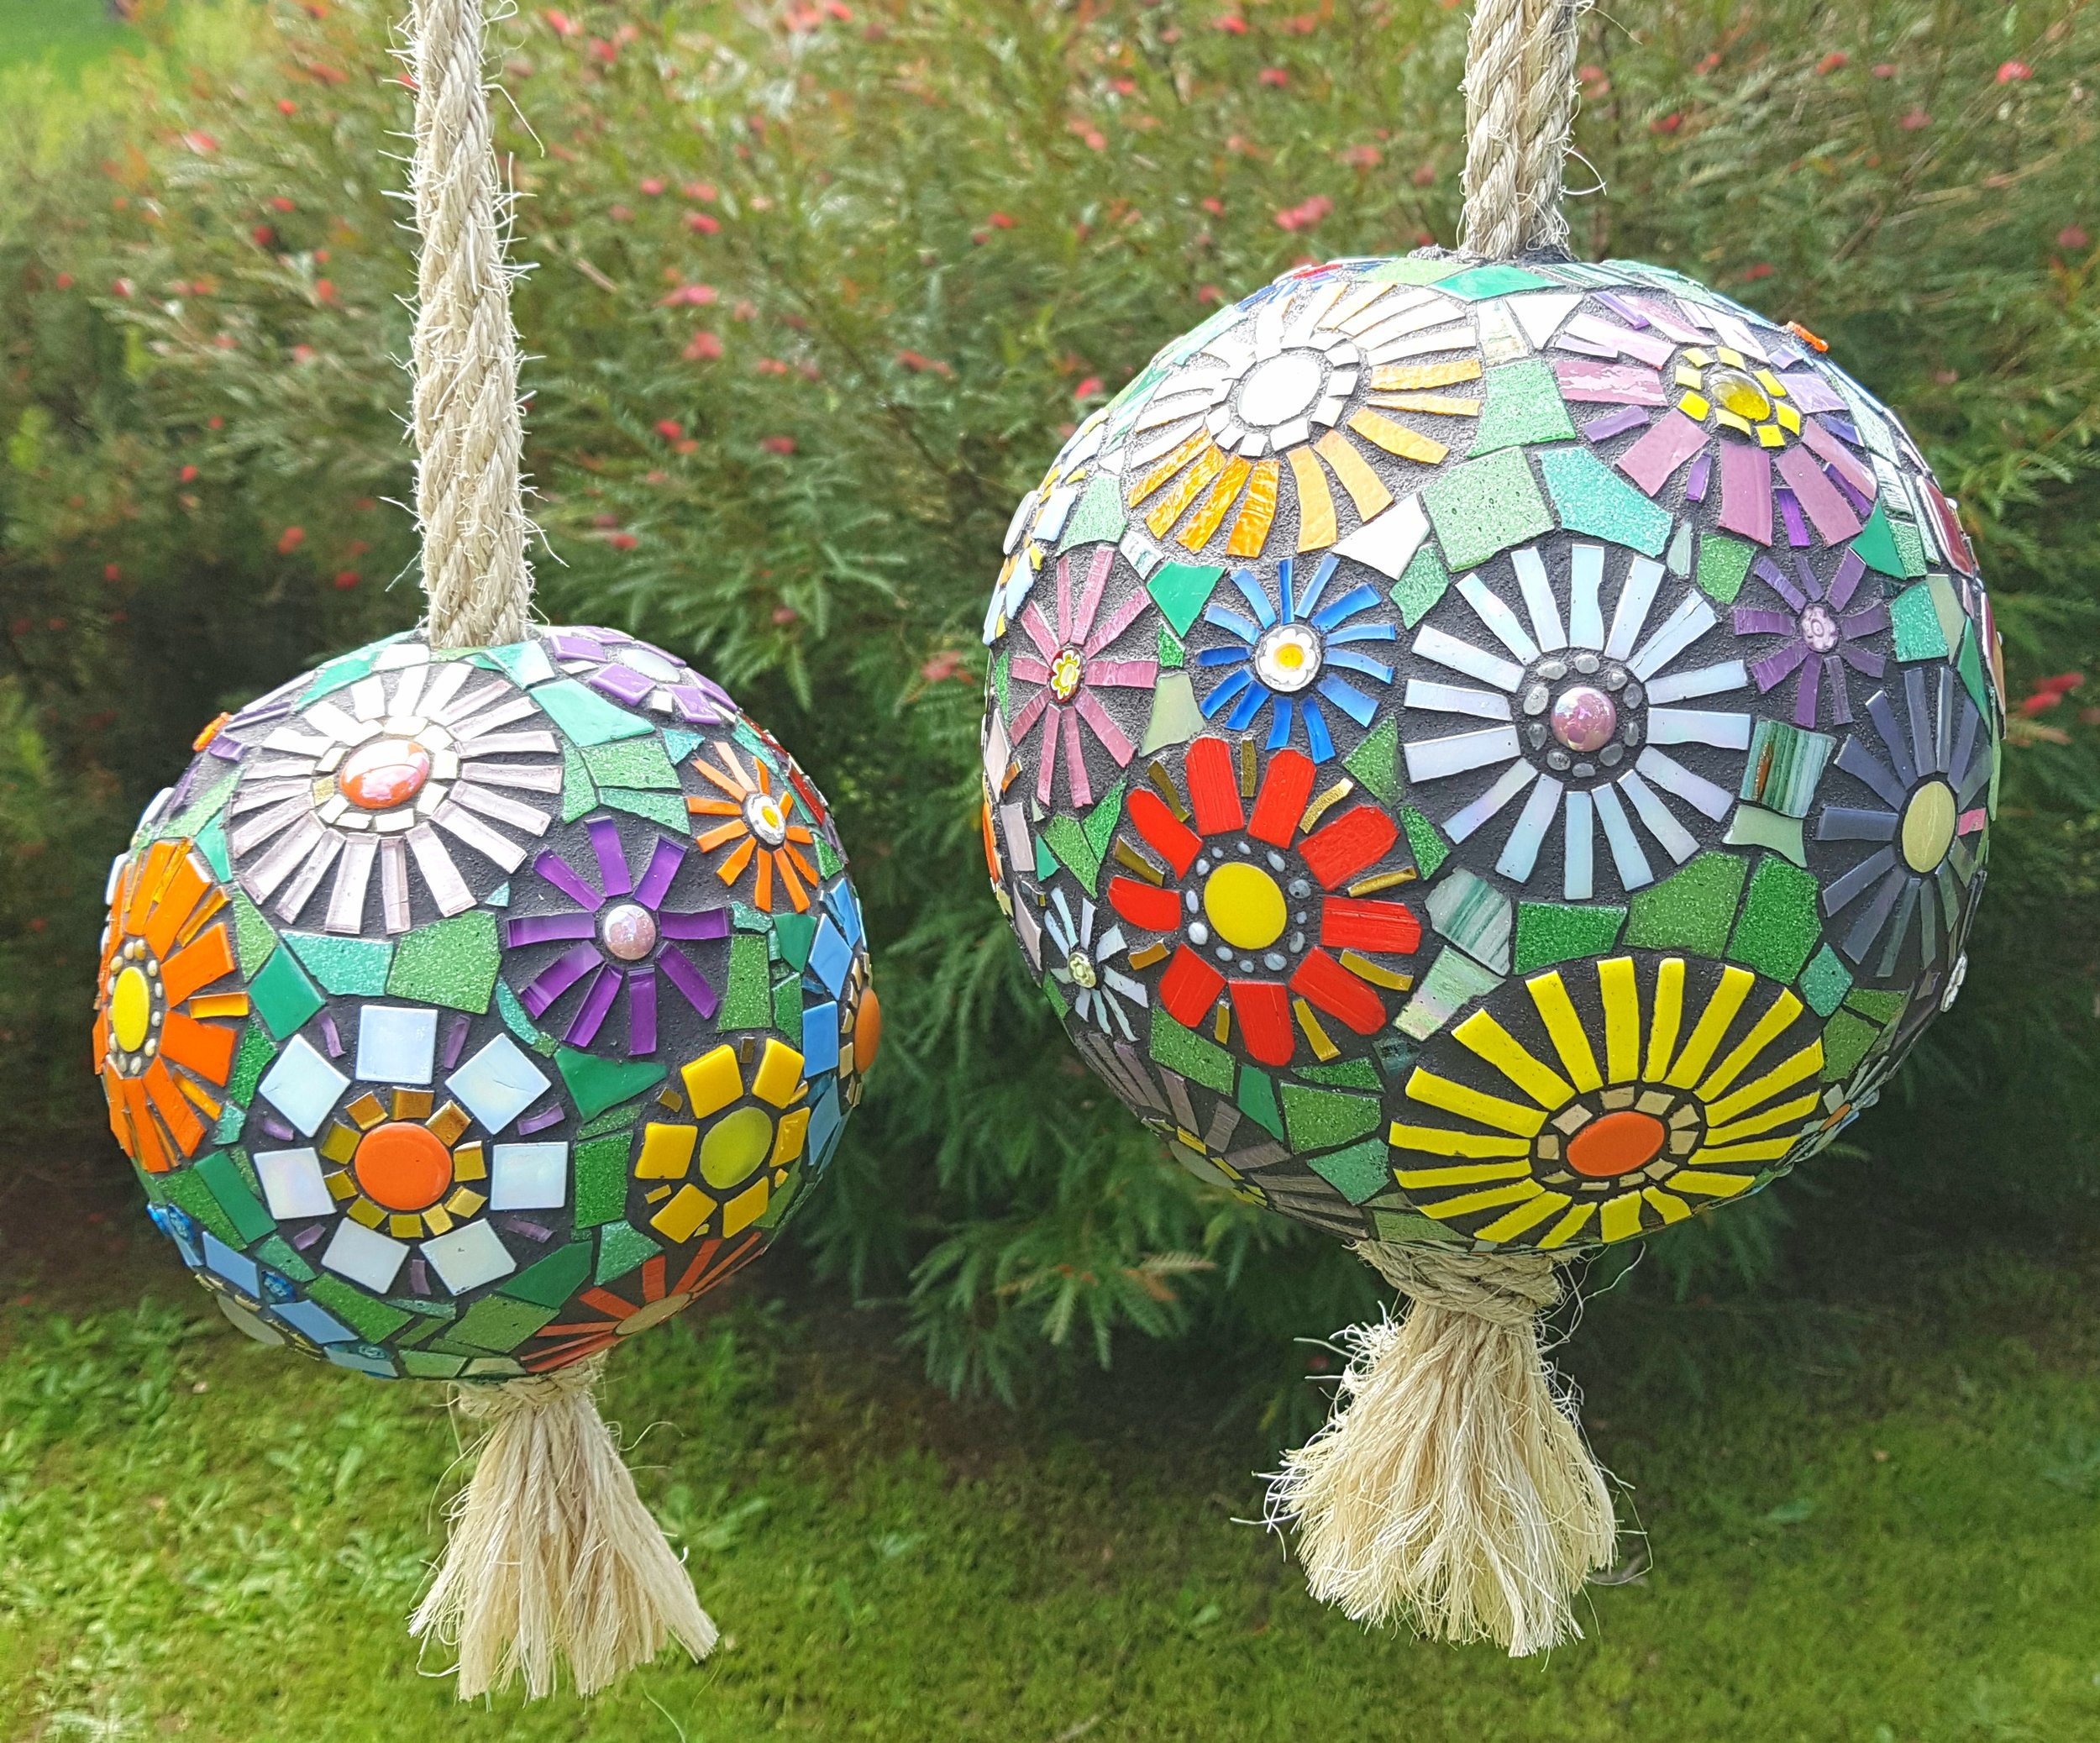 joanna alferink_2018_mosaic spheres_mixed media on polystyrene float_15cm and 20cm.jpg